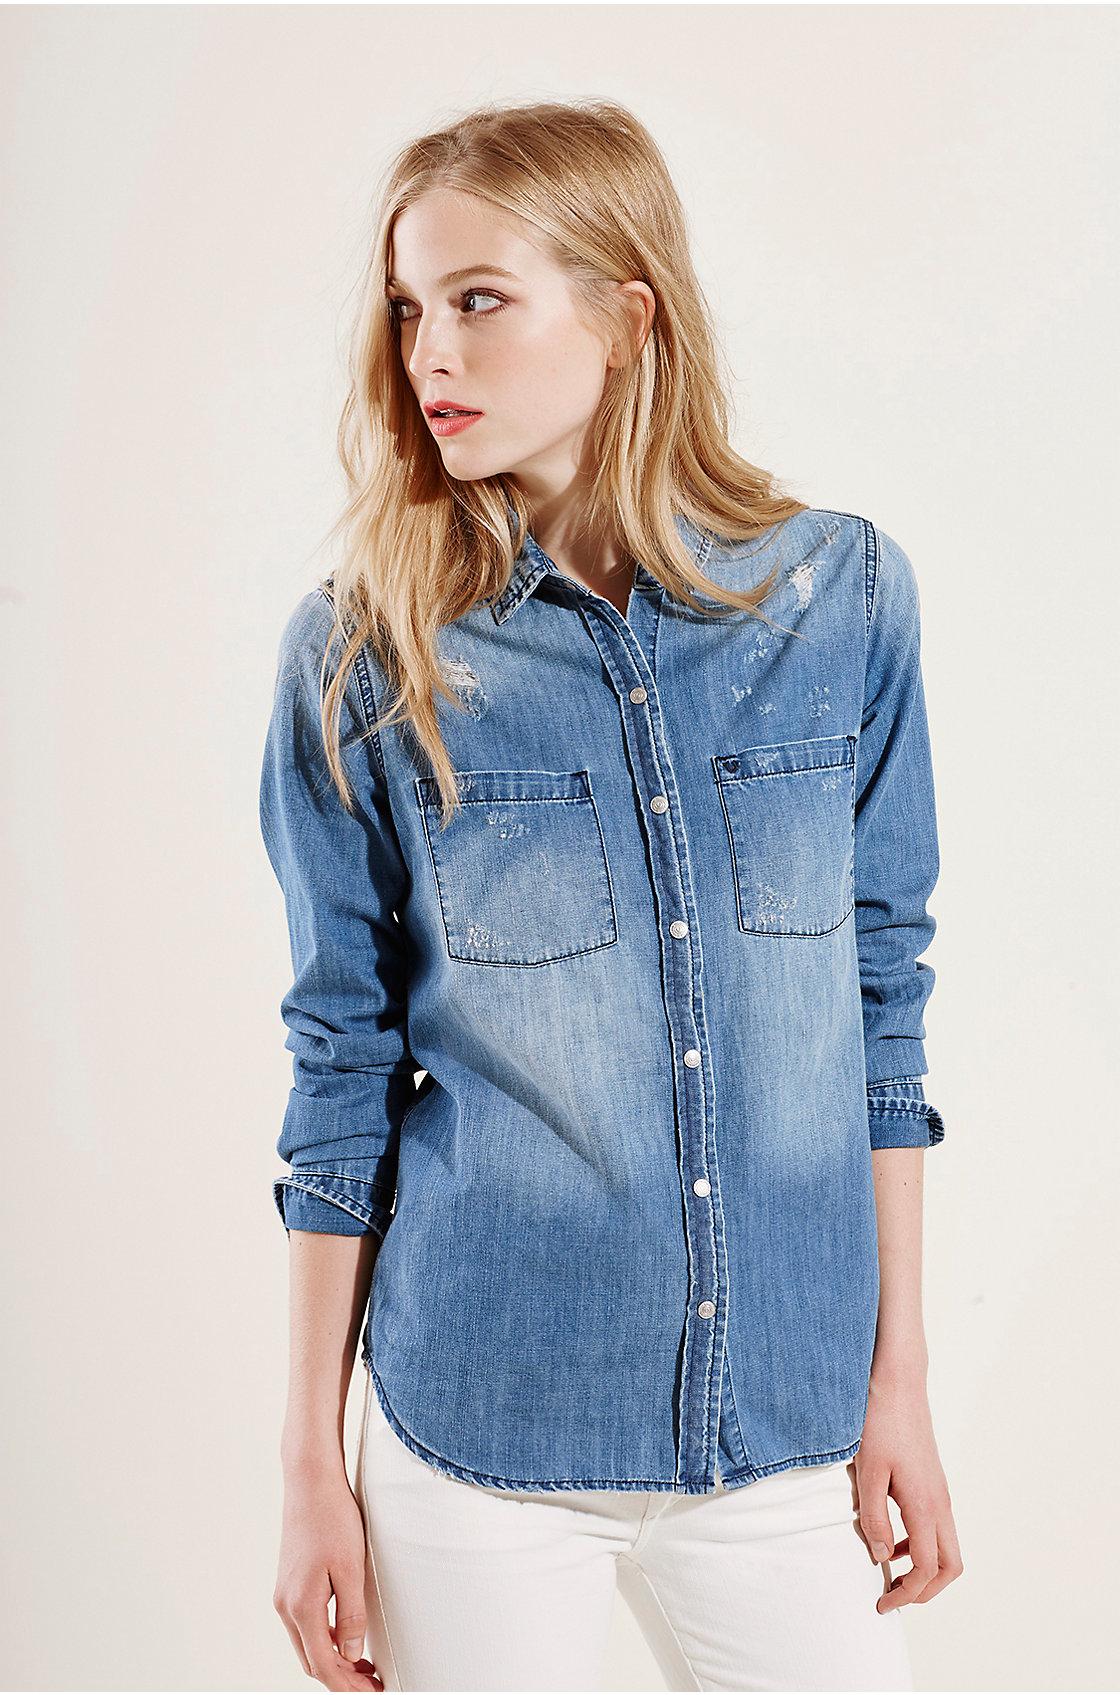 True religion light weight utility denim womens shirt in for Ladies light denim shirt